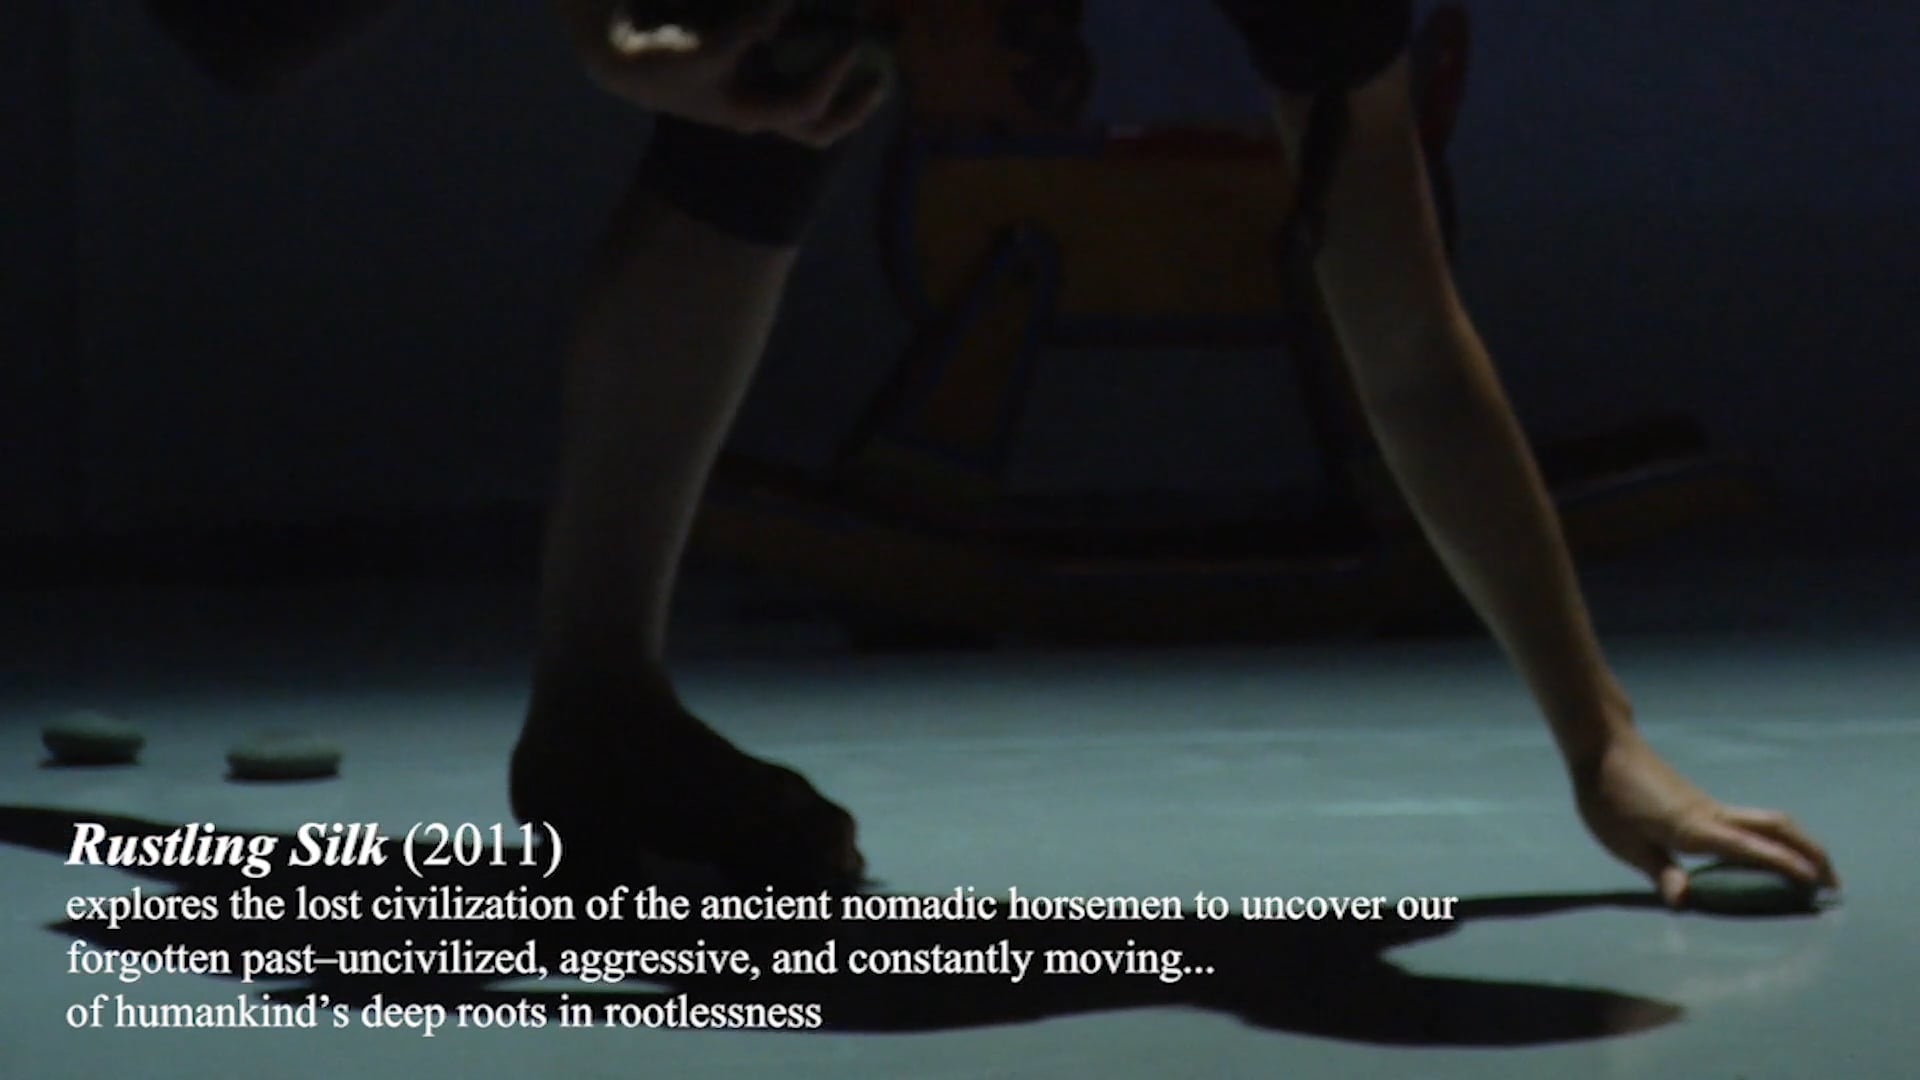 Rustling Silk (2011)